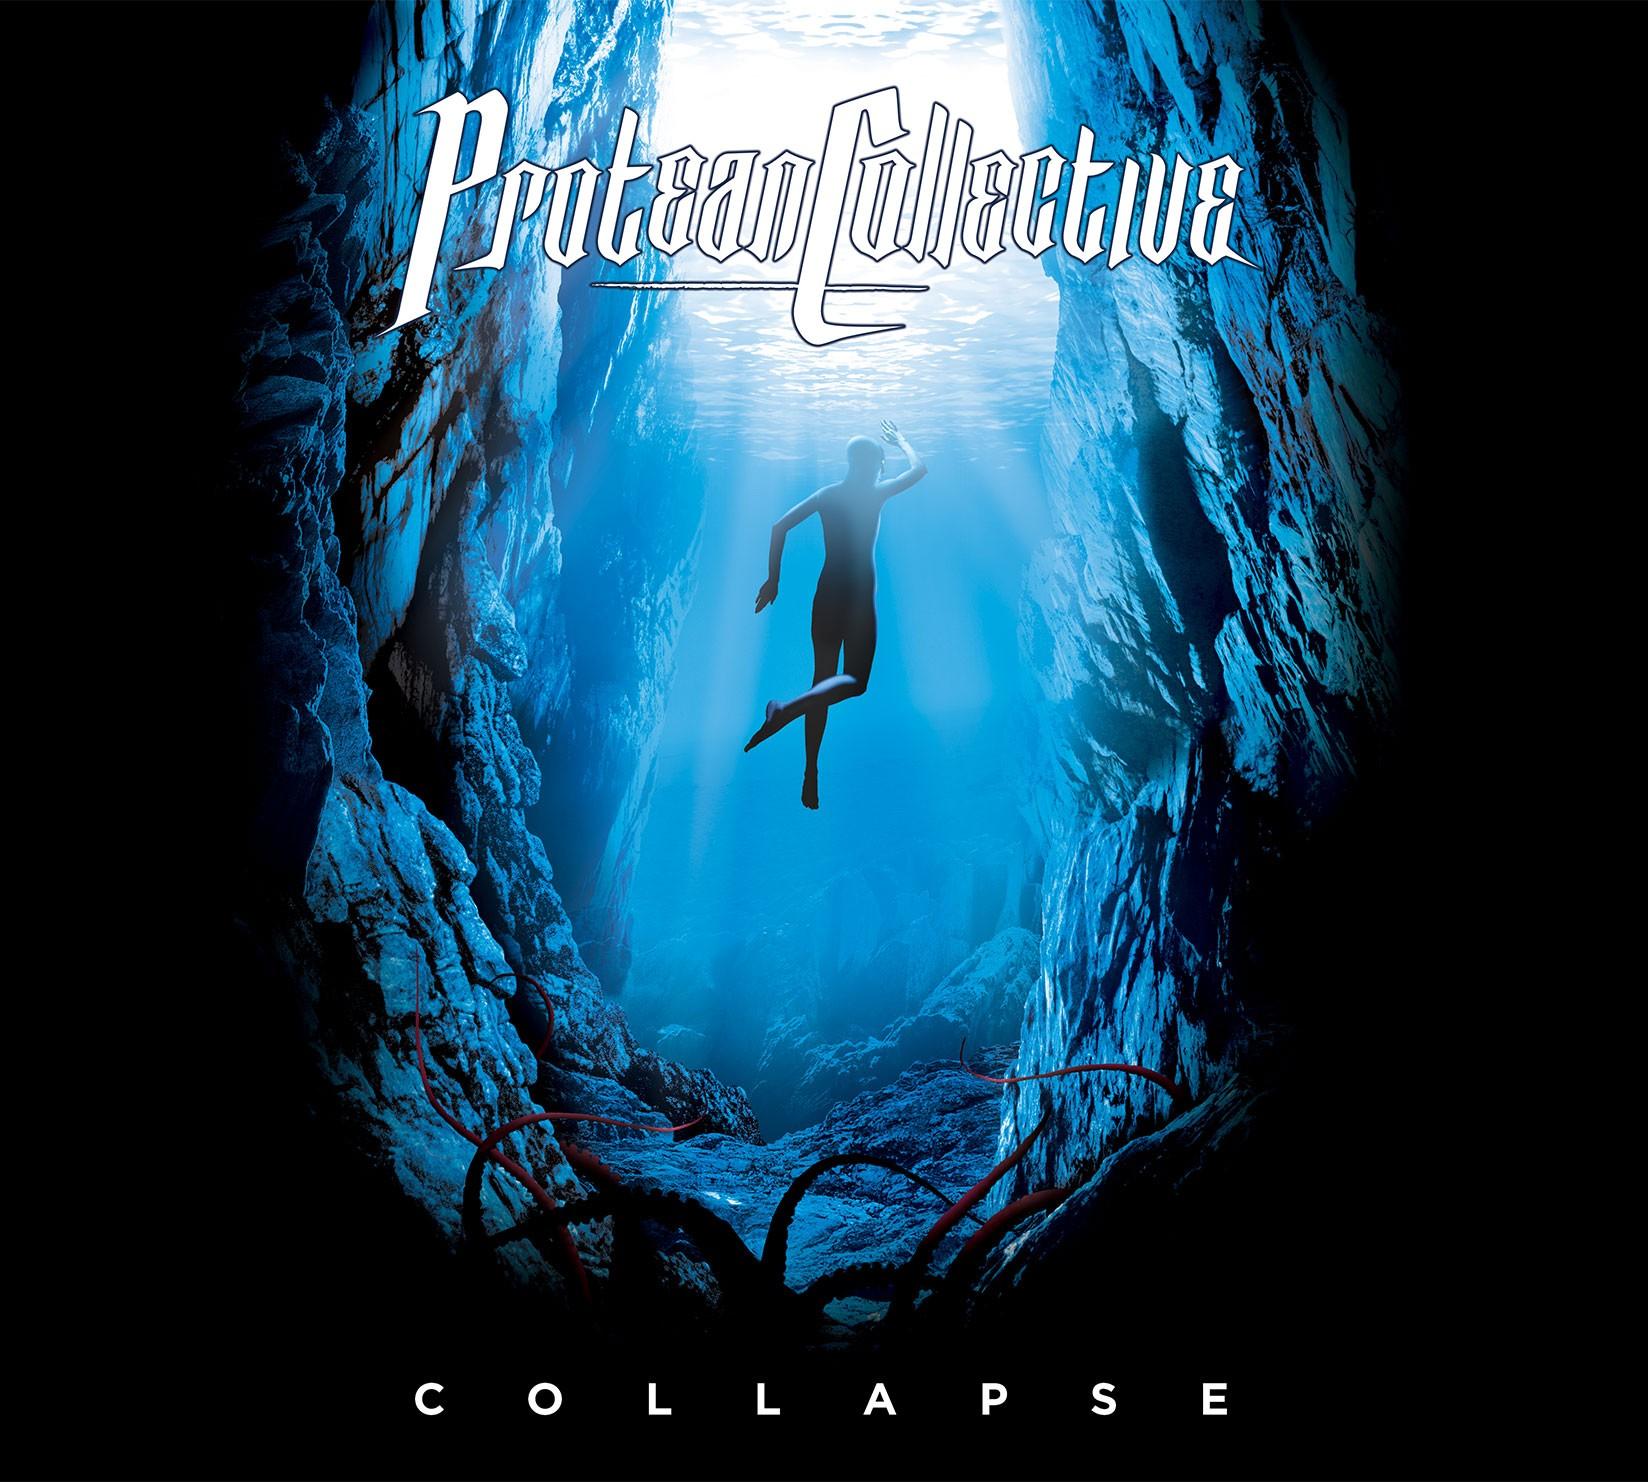 Protean-Collective-Collapse